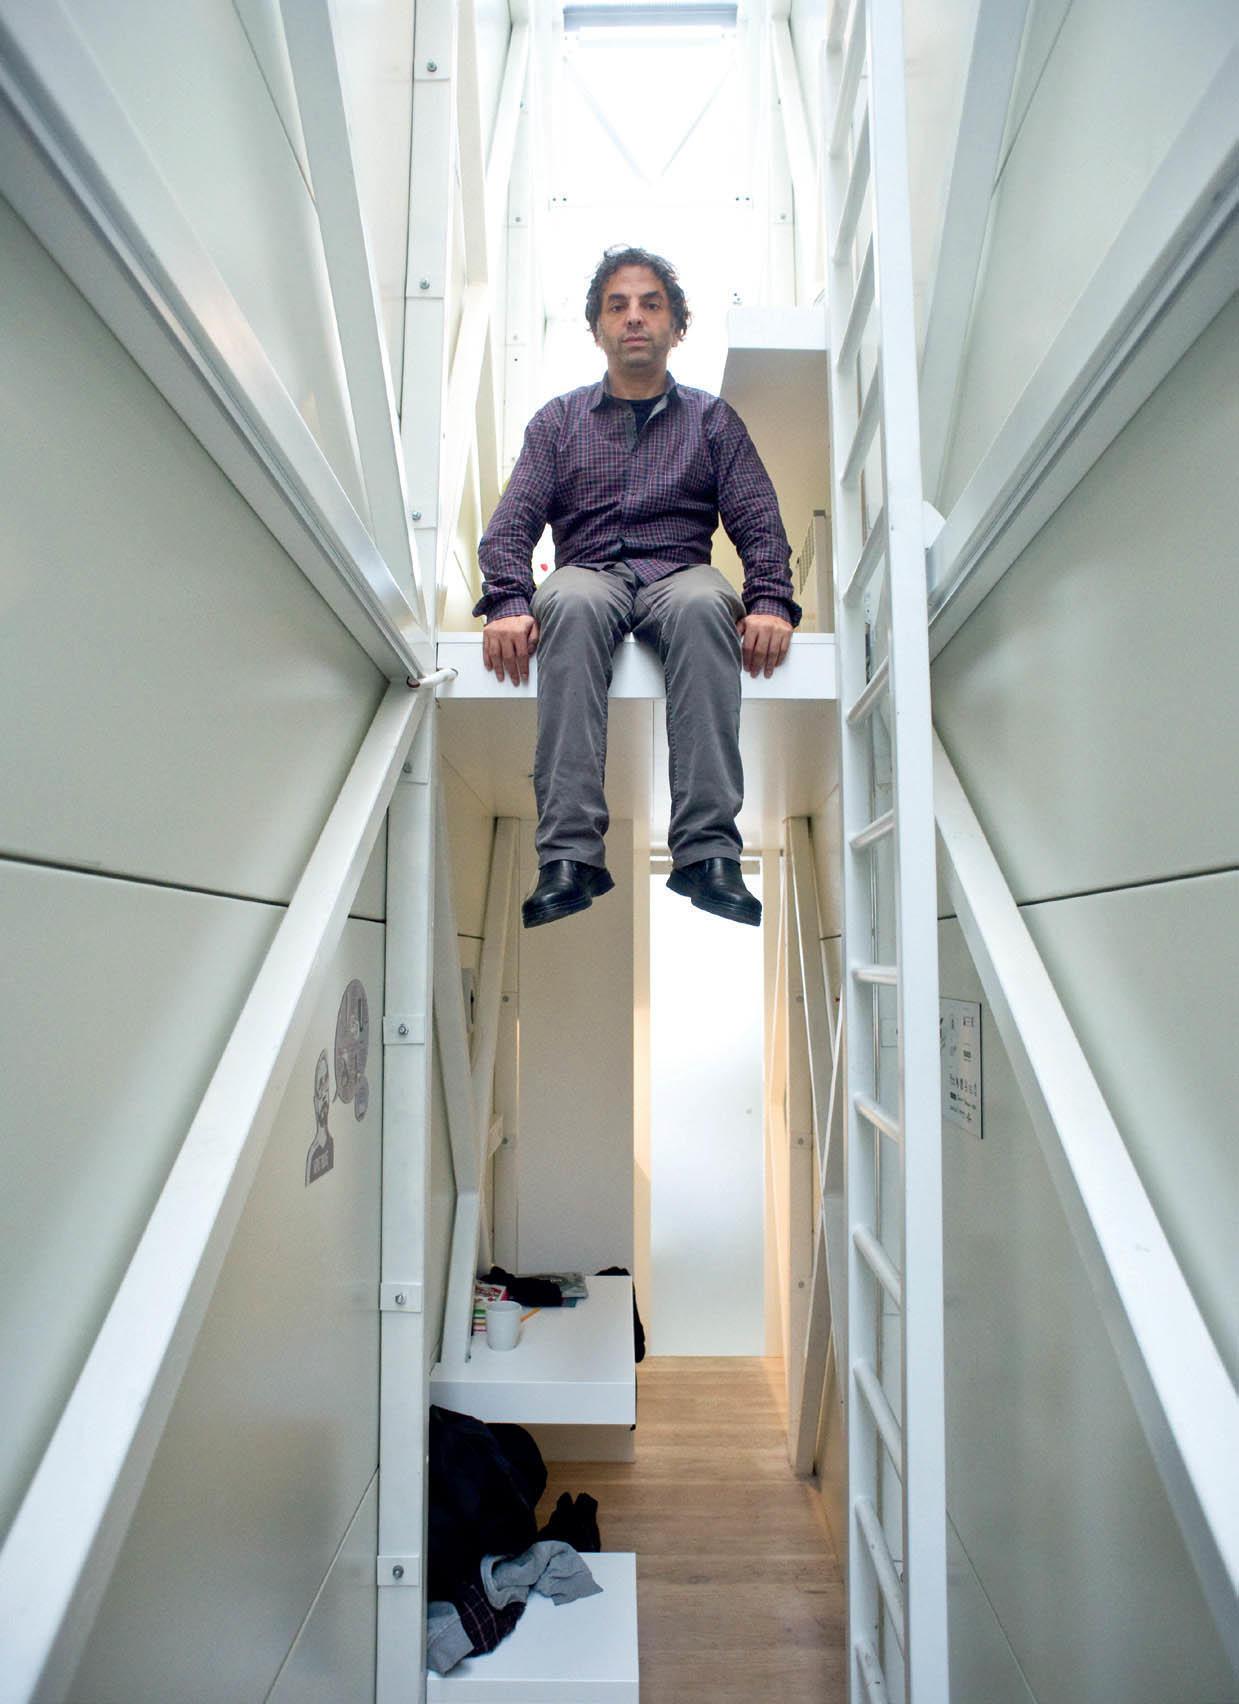 diaforetiko.gr : keret2 Το στενότερο σπίτι στον κόσμο έχει πλάτος περίπου ένα μέτρο αλλά χωρά τα πάντα!